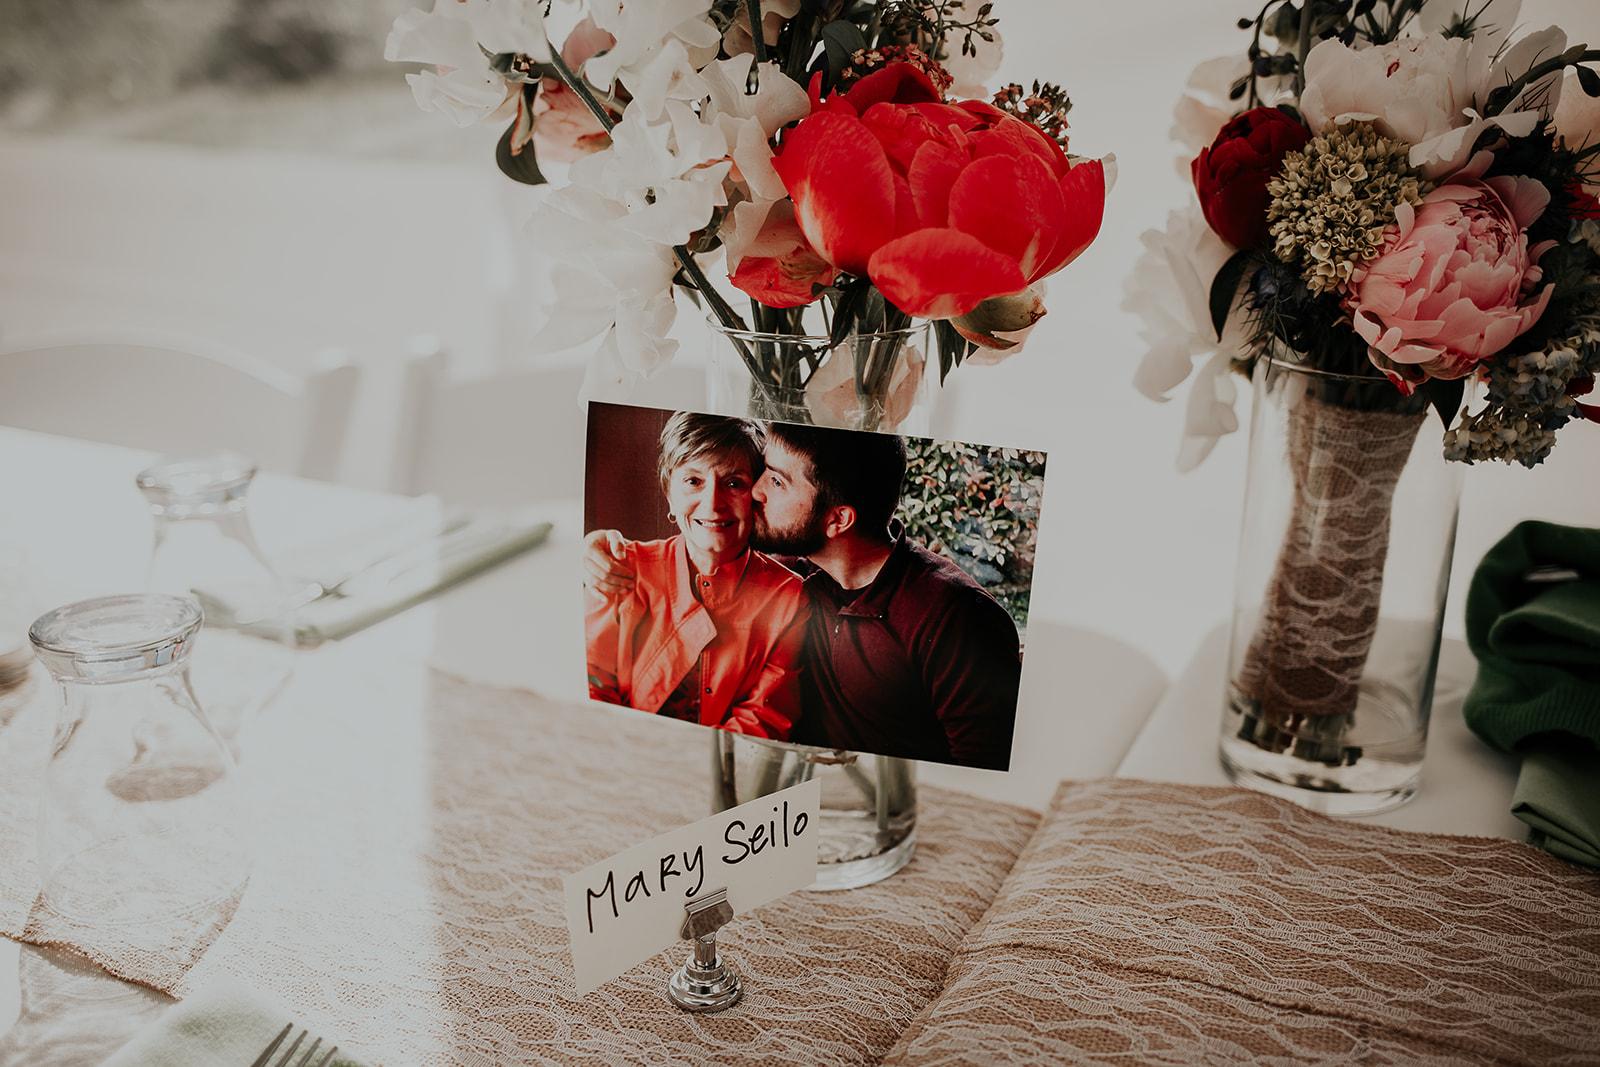 north-cascades-elopement-wedding-winthrop-wedding-photographer-megan-gallagher-photography (6).jpg